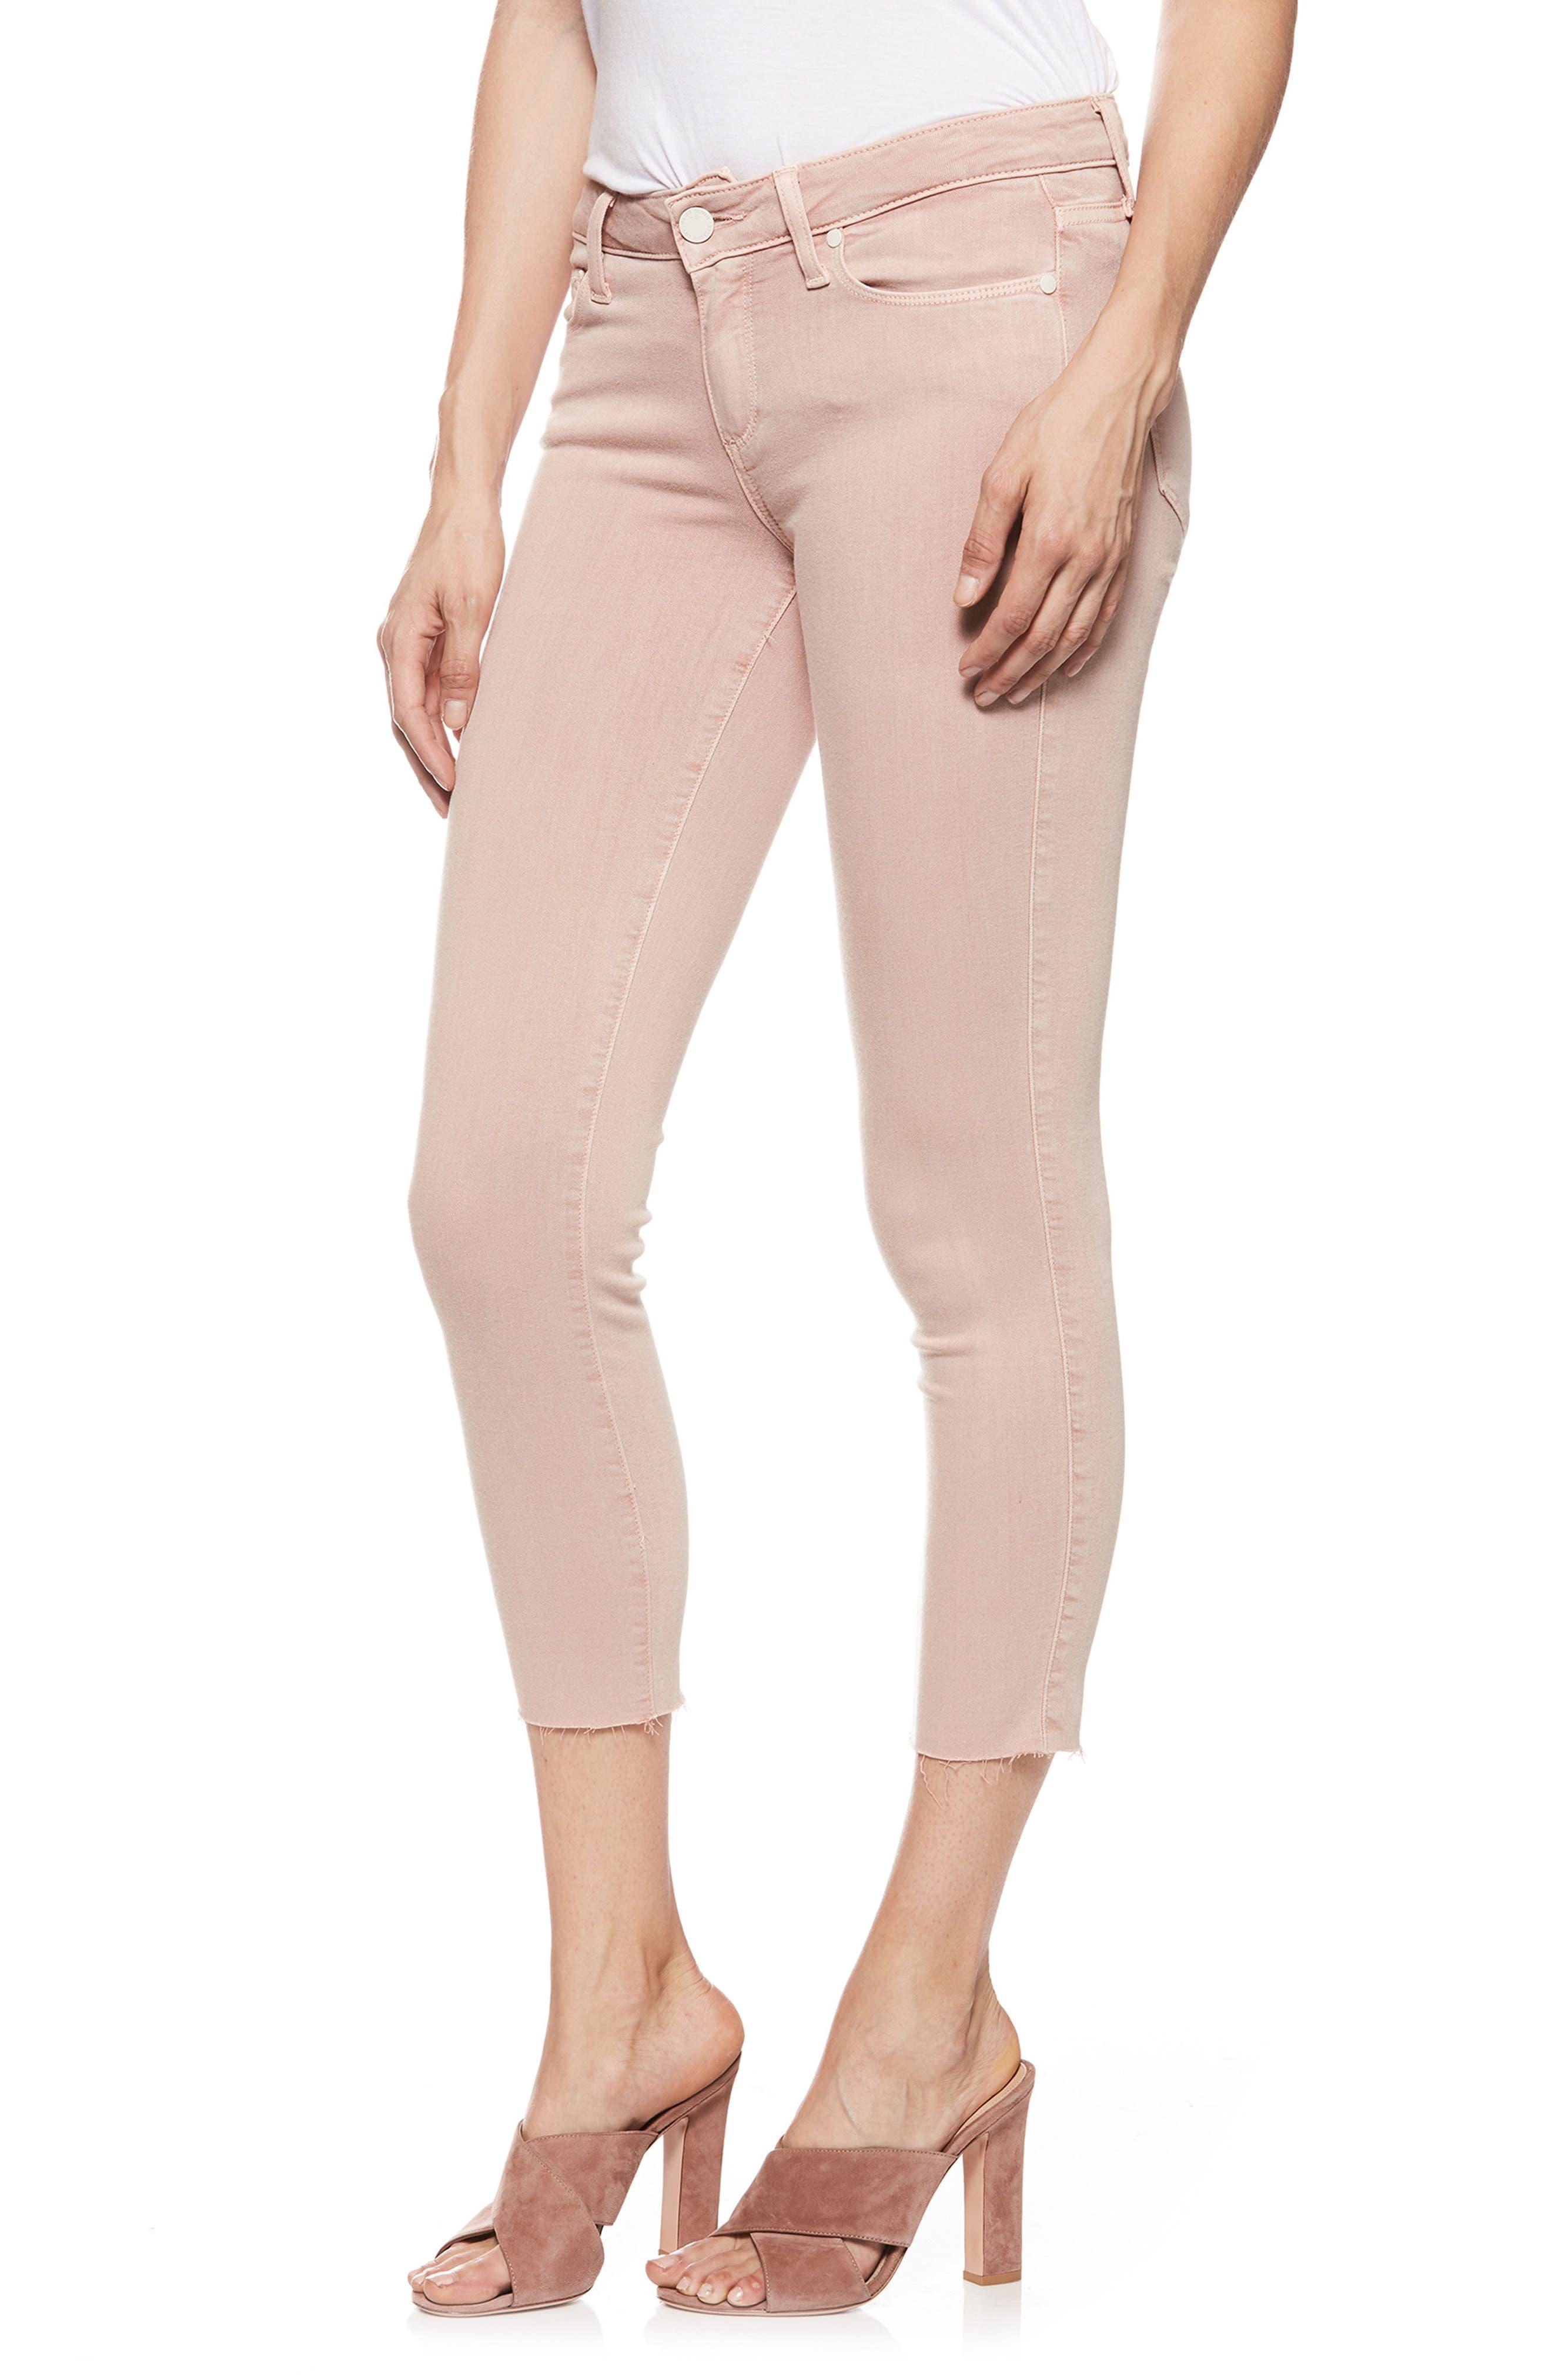 PAIGE Transcend - Verdugo Raw Hem Crop Skinny Jeans (Vintage California Rose)